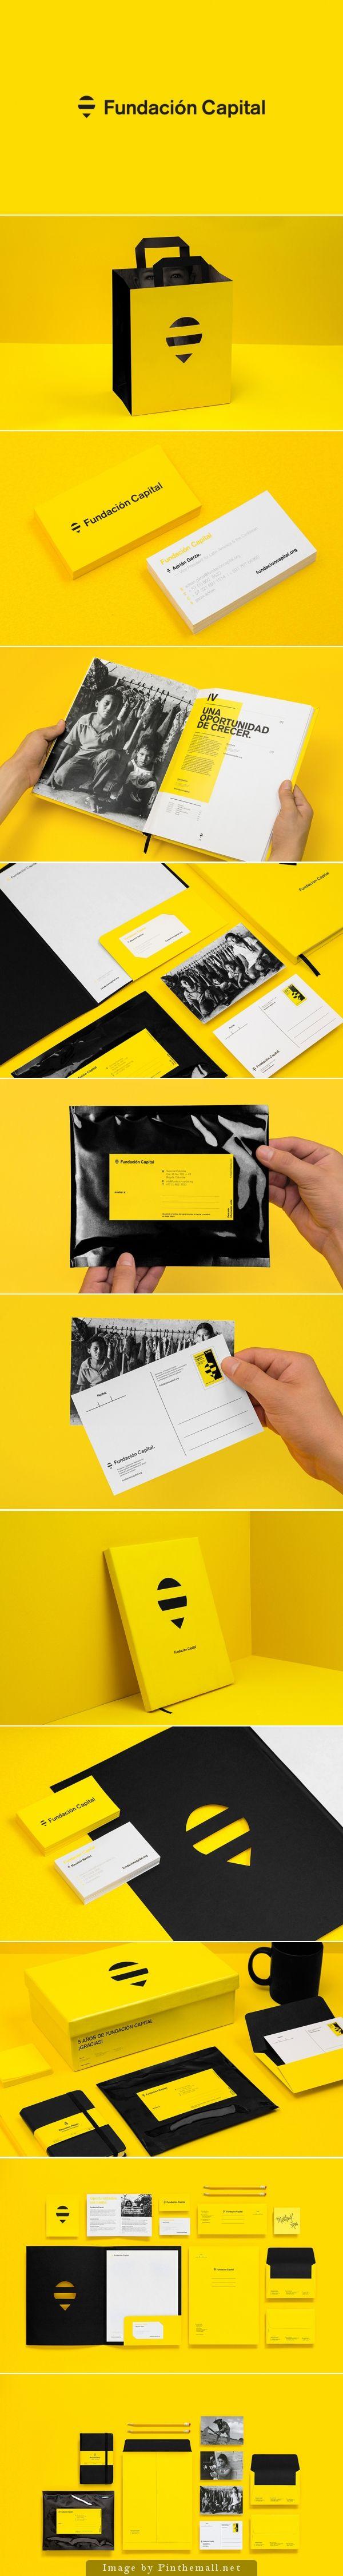 Corporate identity branding stationary yellow black enveloppe business card letterhead cover shopping bag logo postcard brochure graphic design